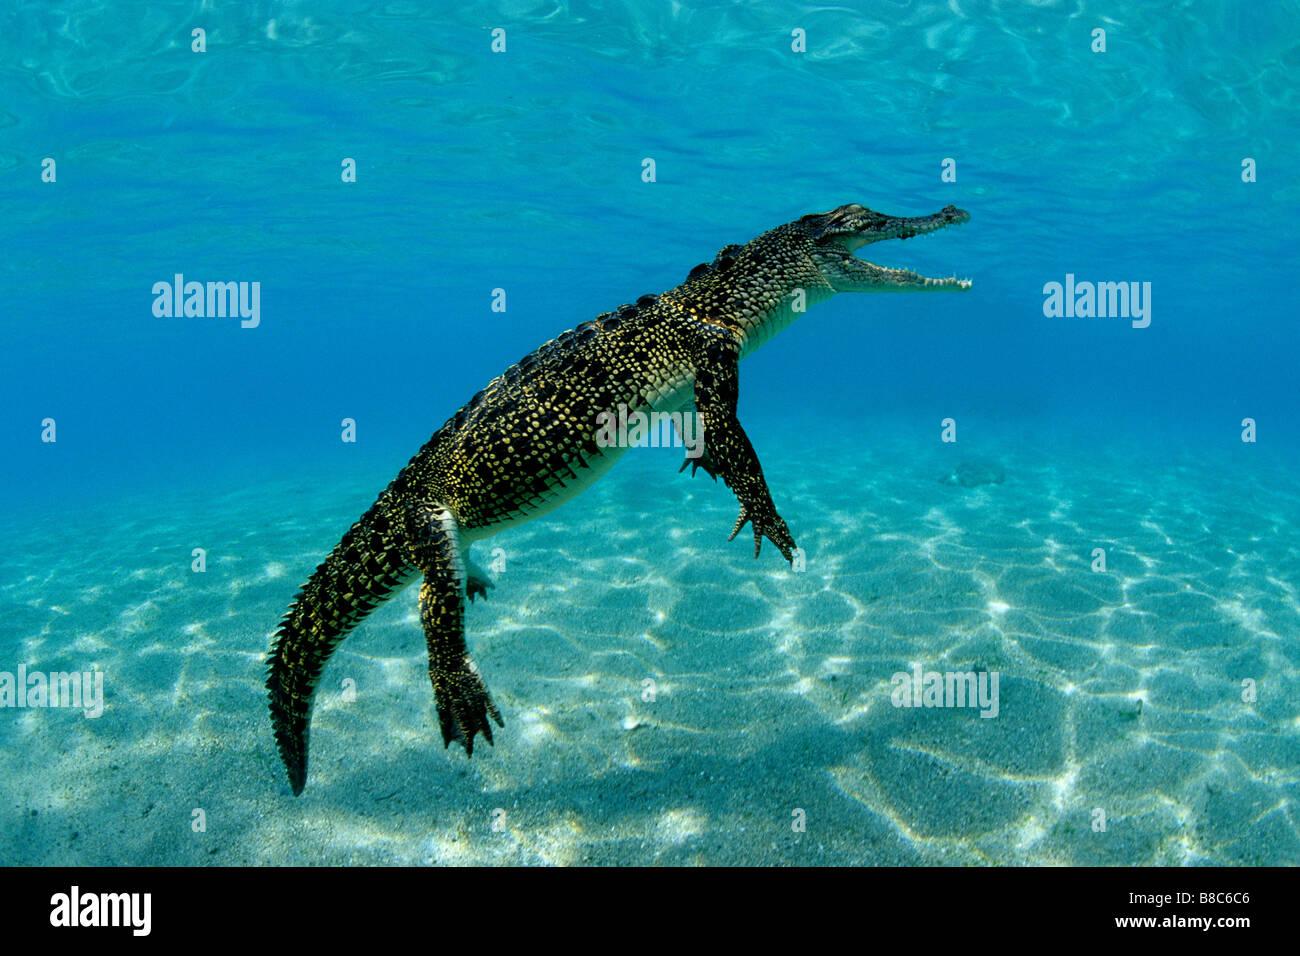 Saltwater crocodile - Stock Image